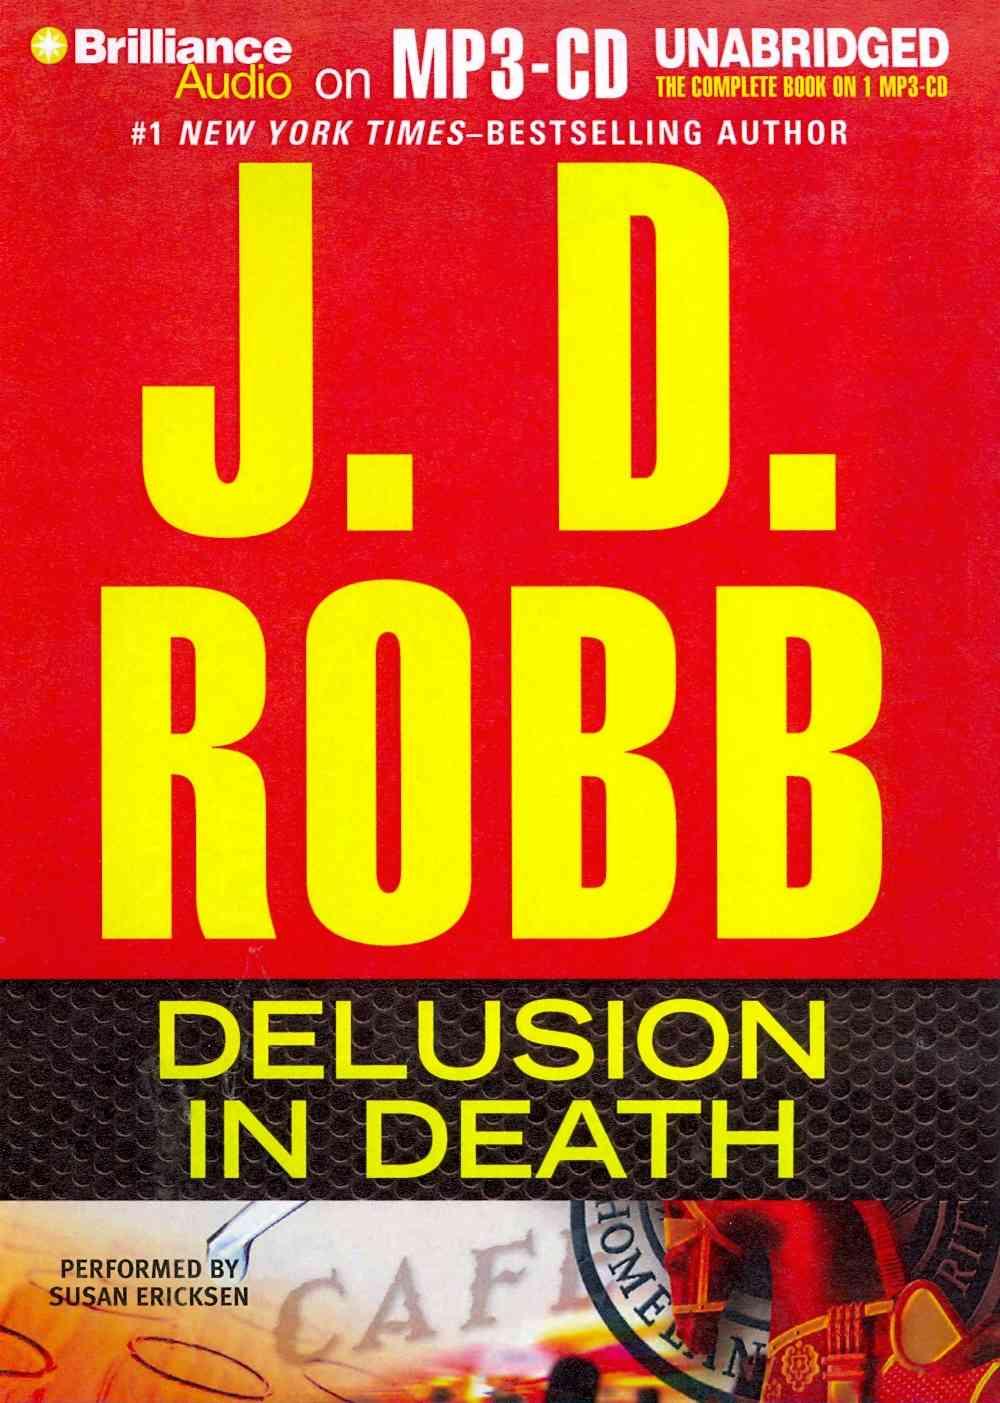 Delusion in Death (CD-Audio)